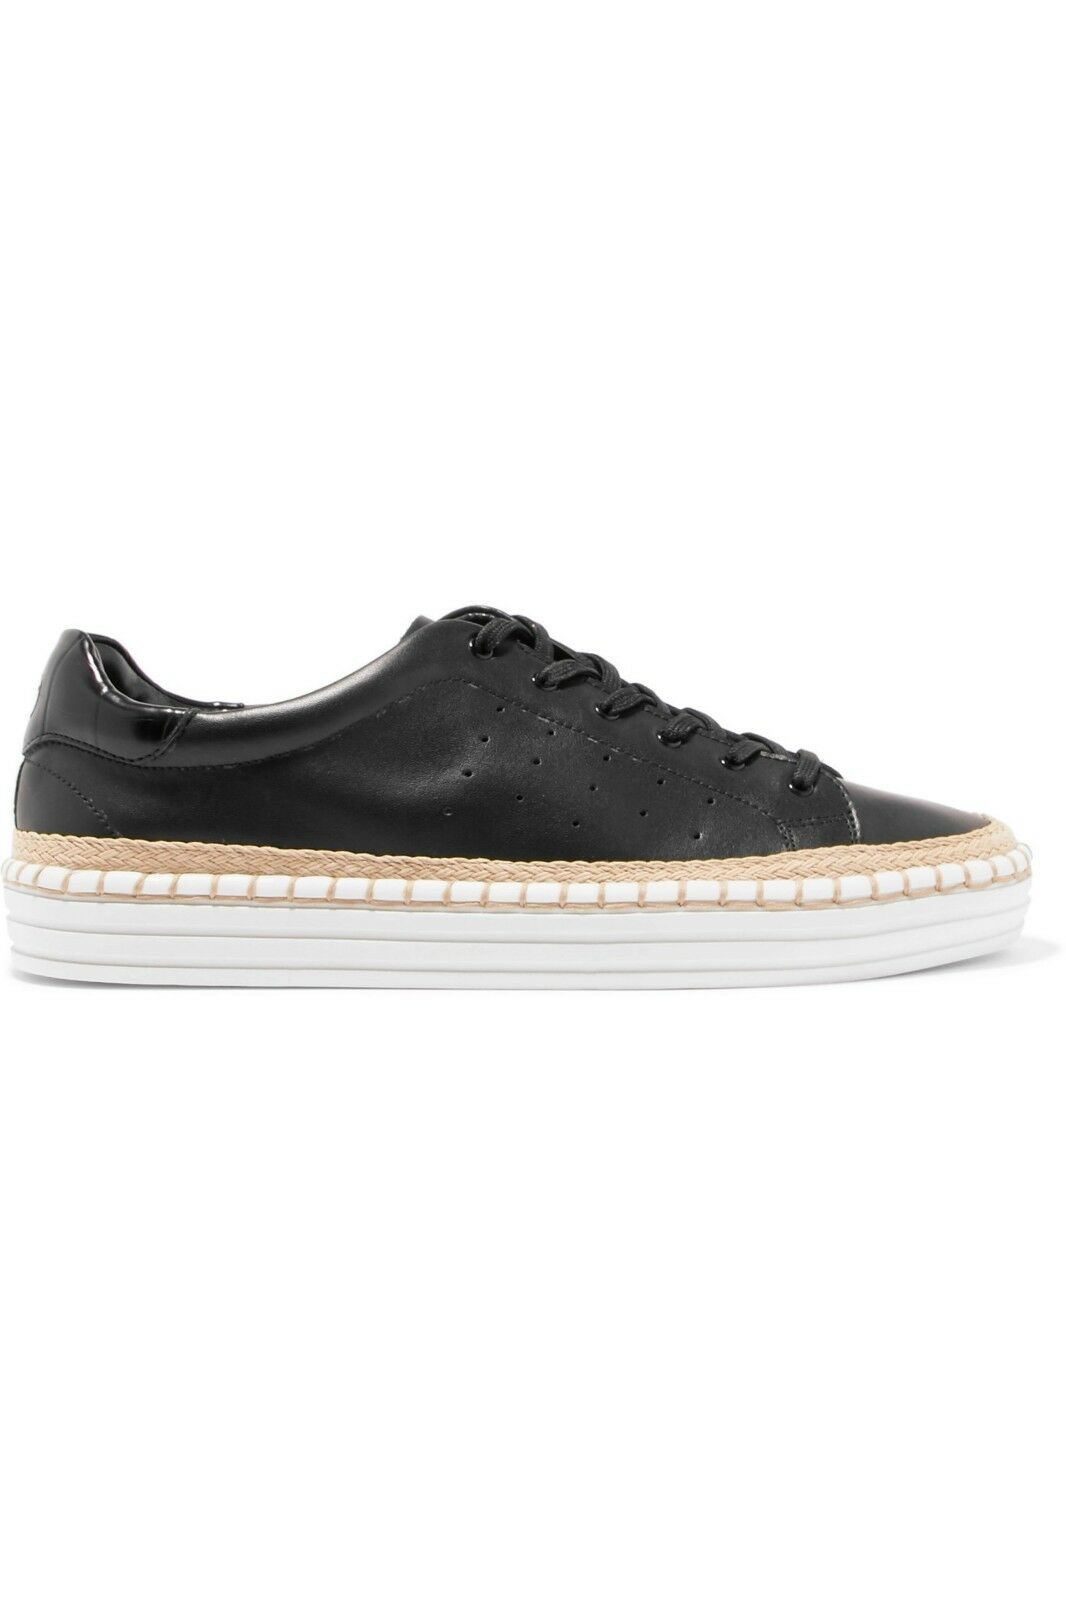 Sam Edelman Kavi black leather wedge platform sneakers trainers 5 BNIB